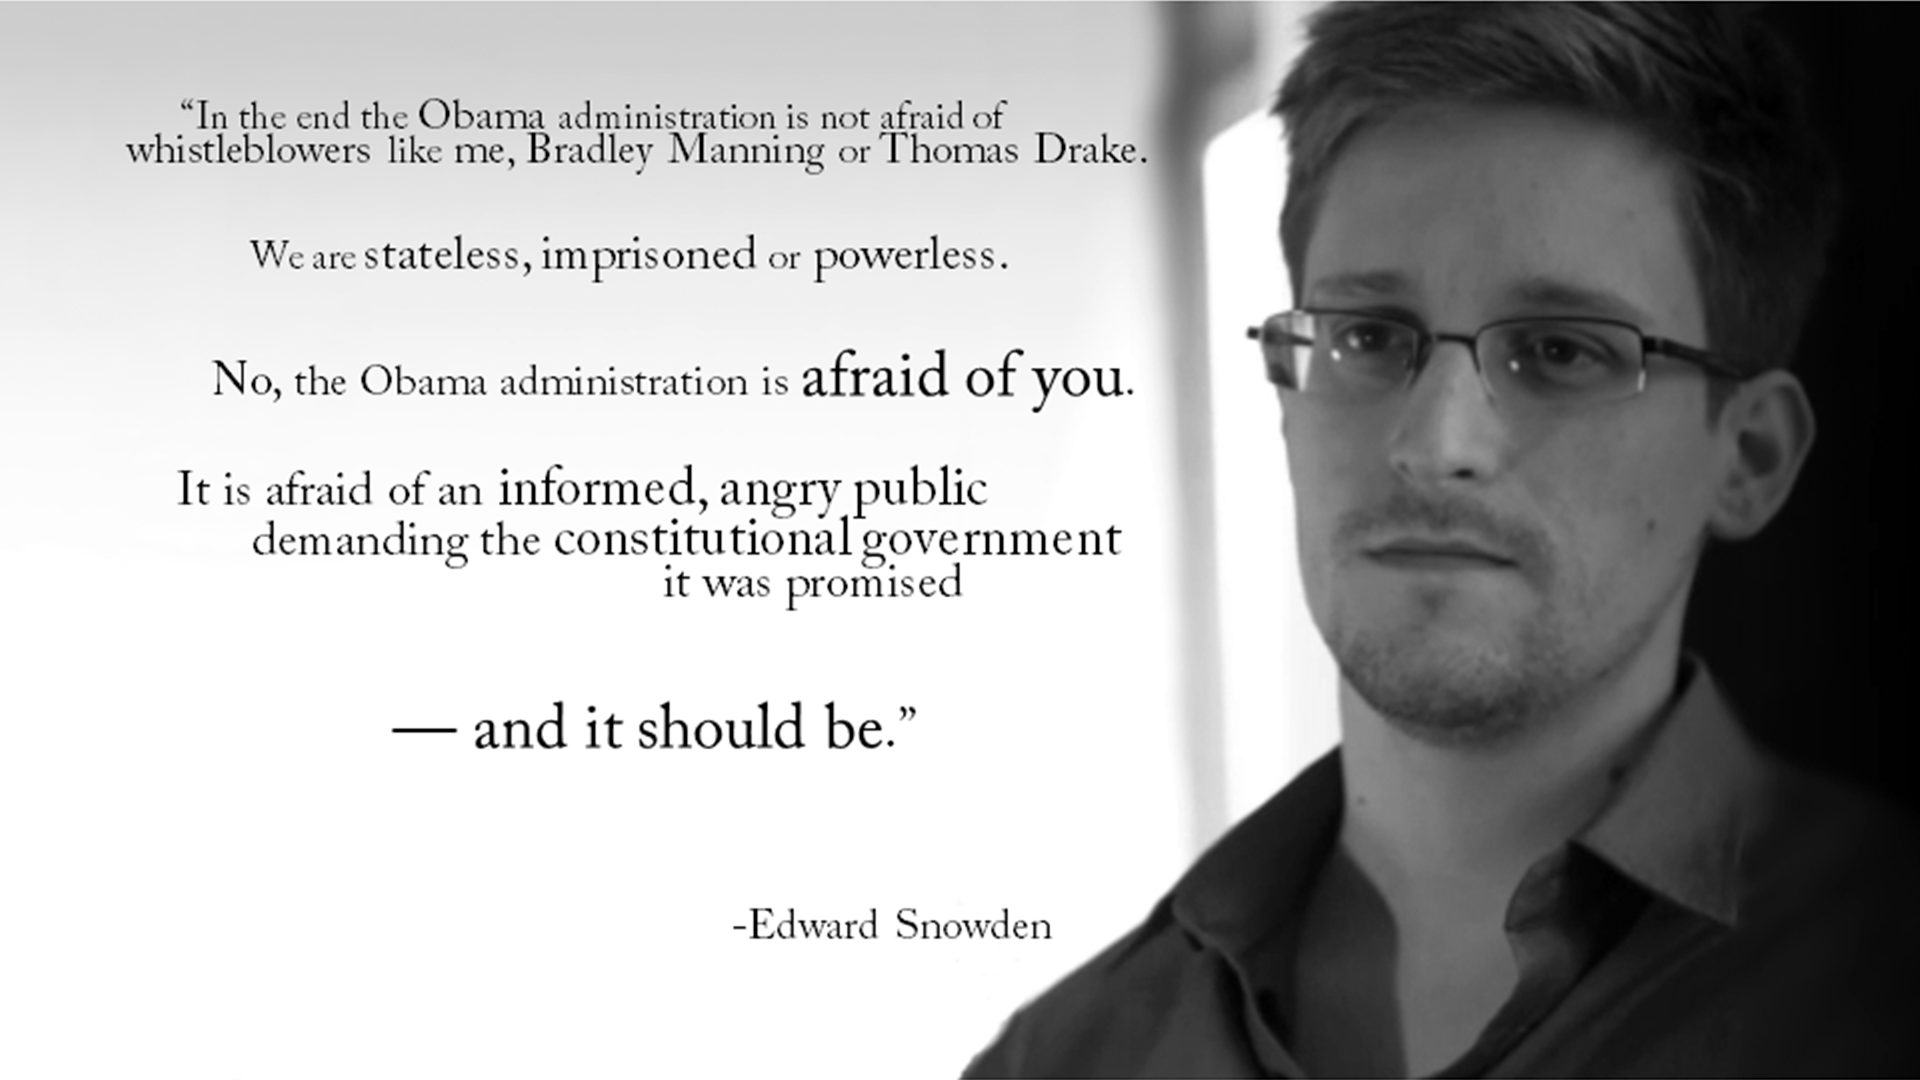 Edward Snowden's quote #8